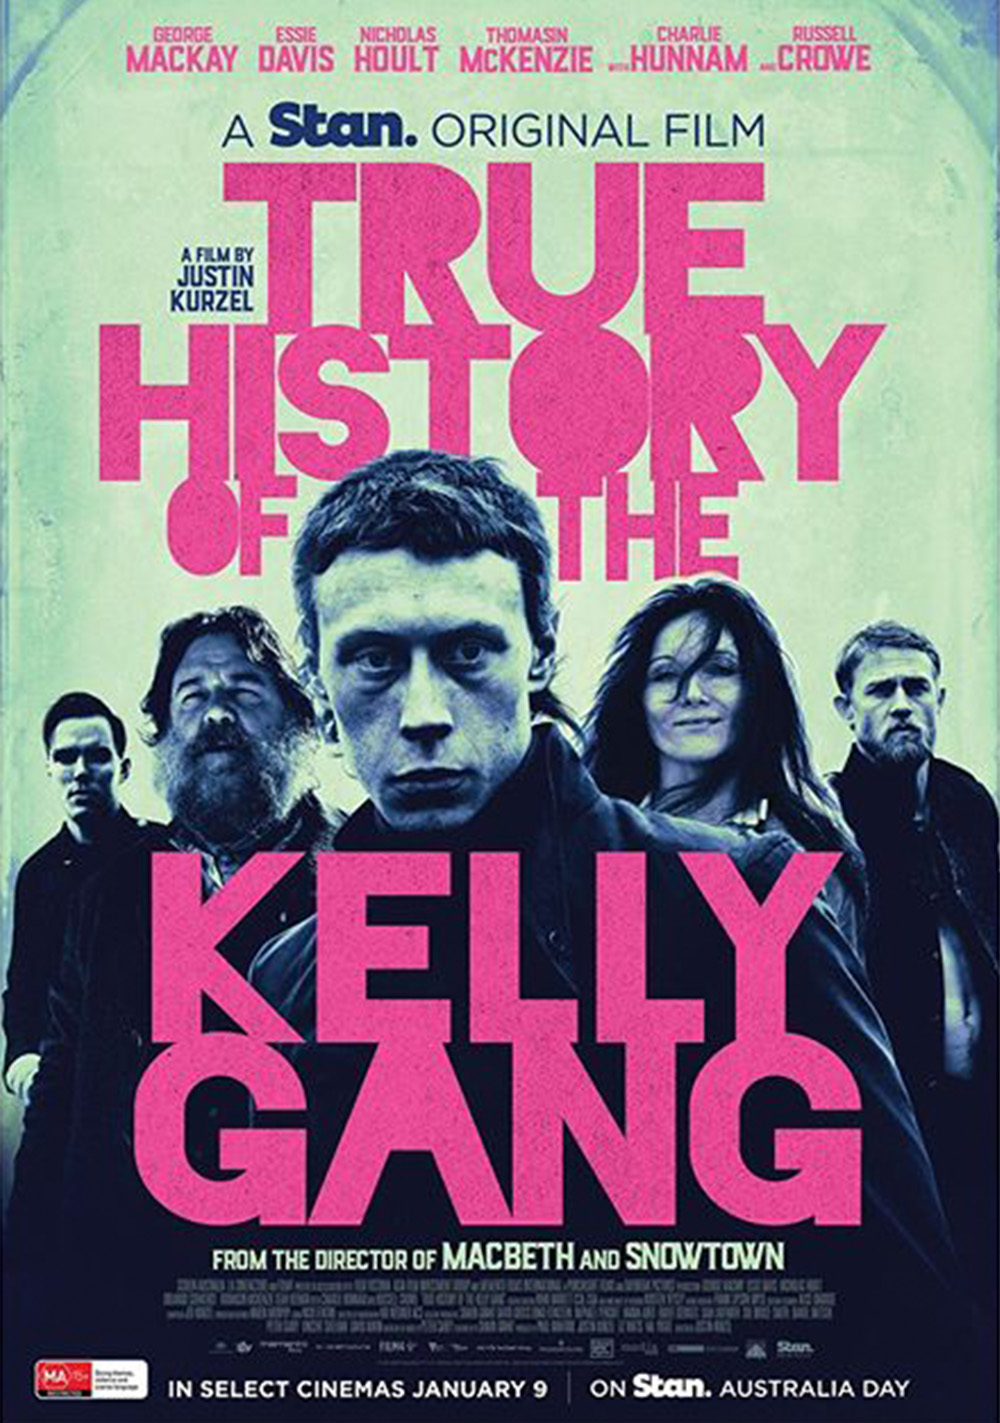 Kelly Gang